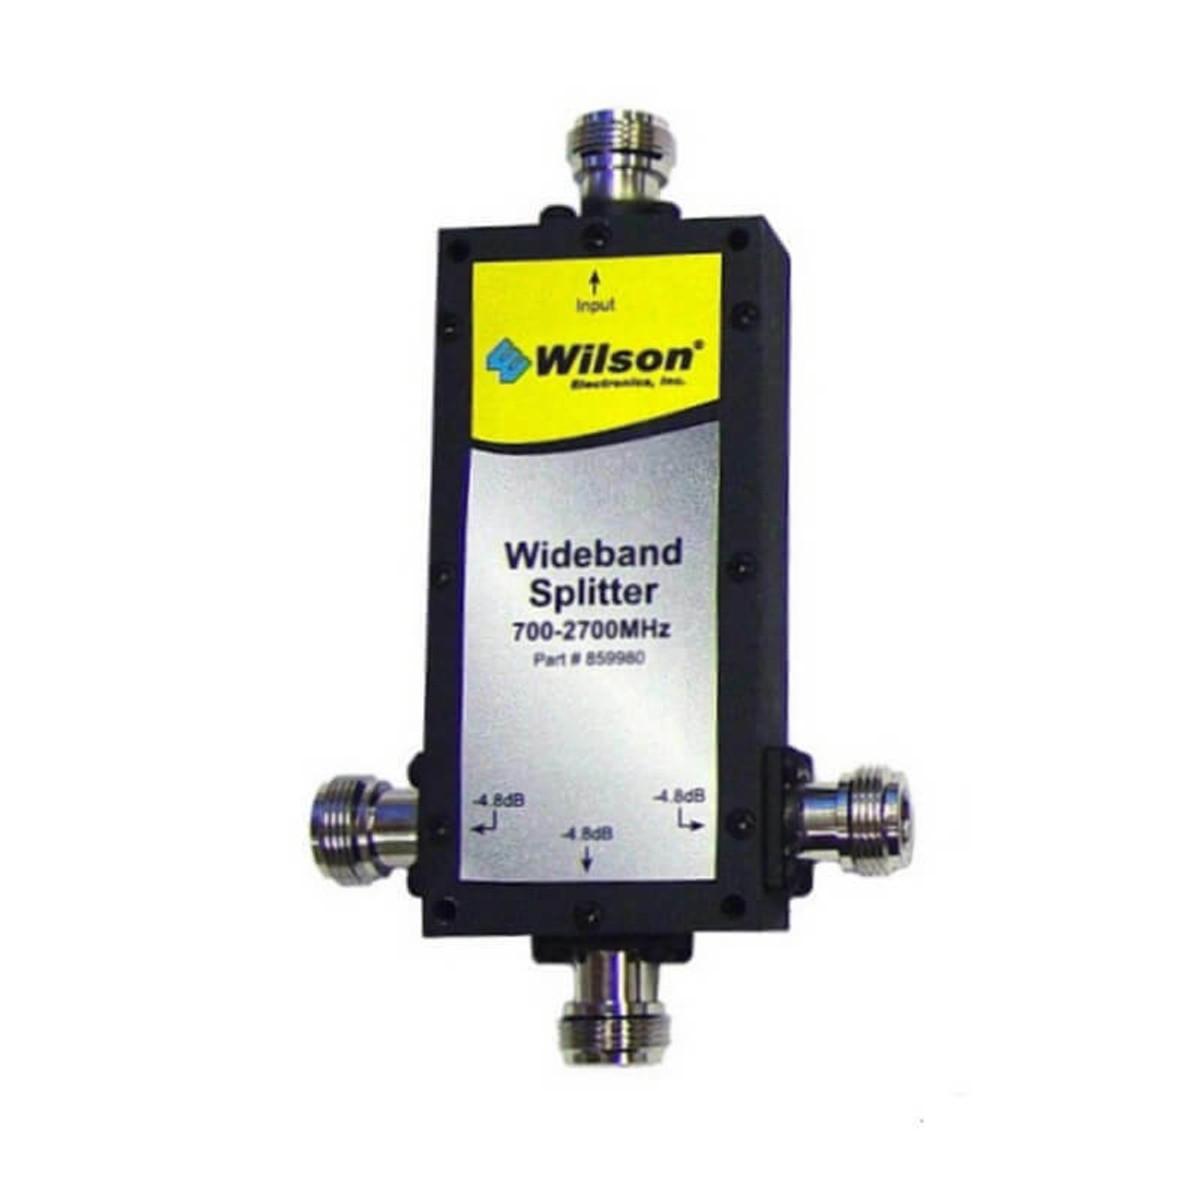 Wilson Electronics Wilson Dual Antenna Expansion Kit 50 Ohm - 309907-50N